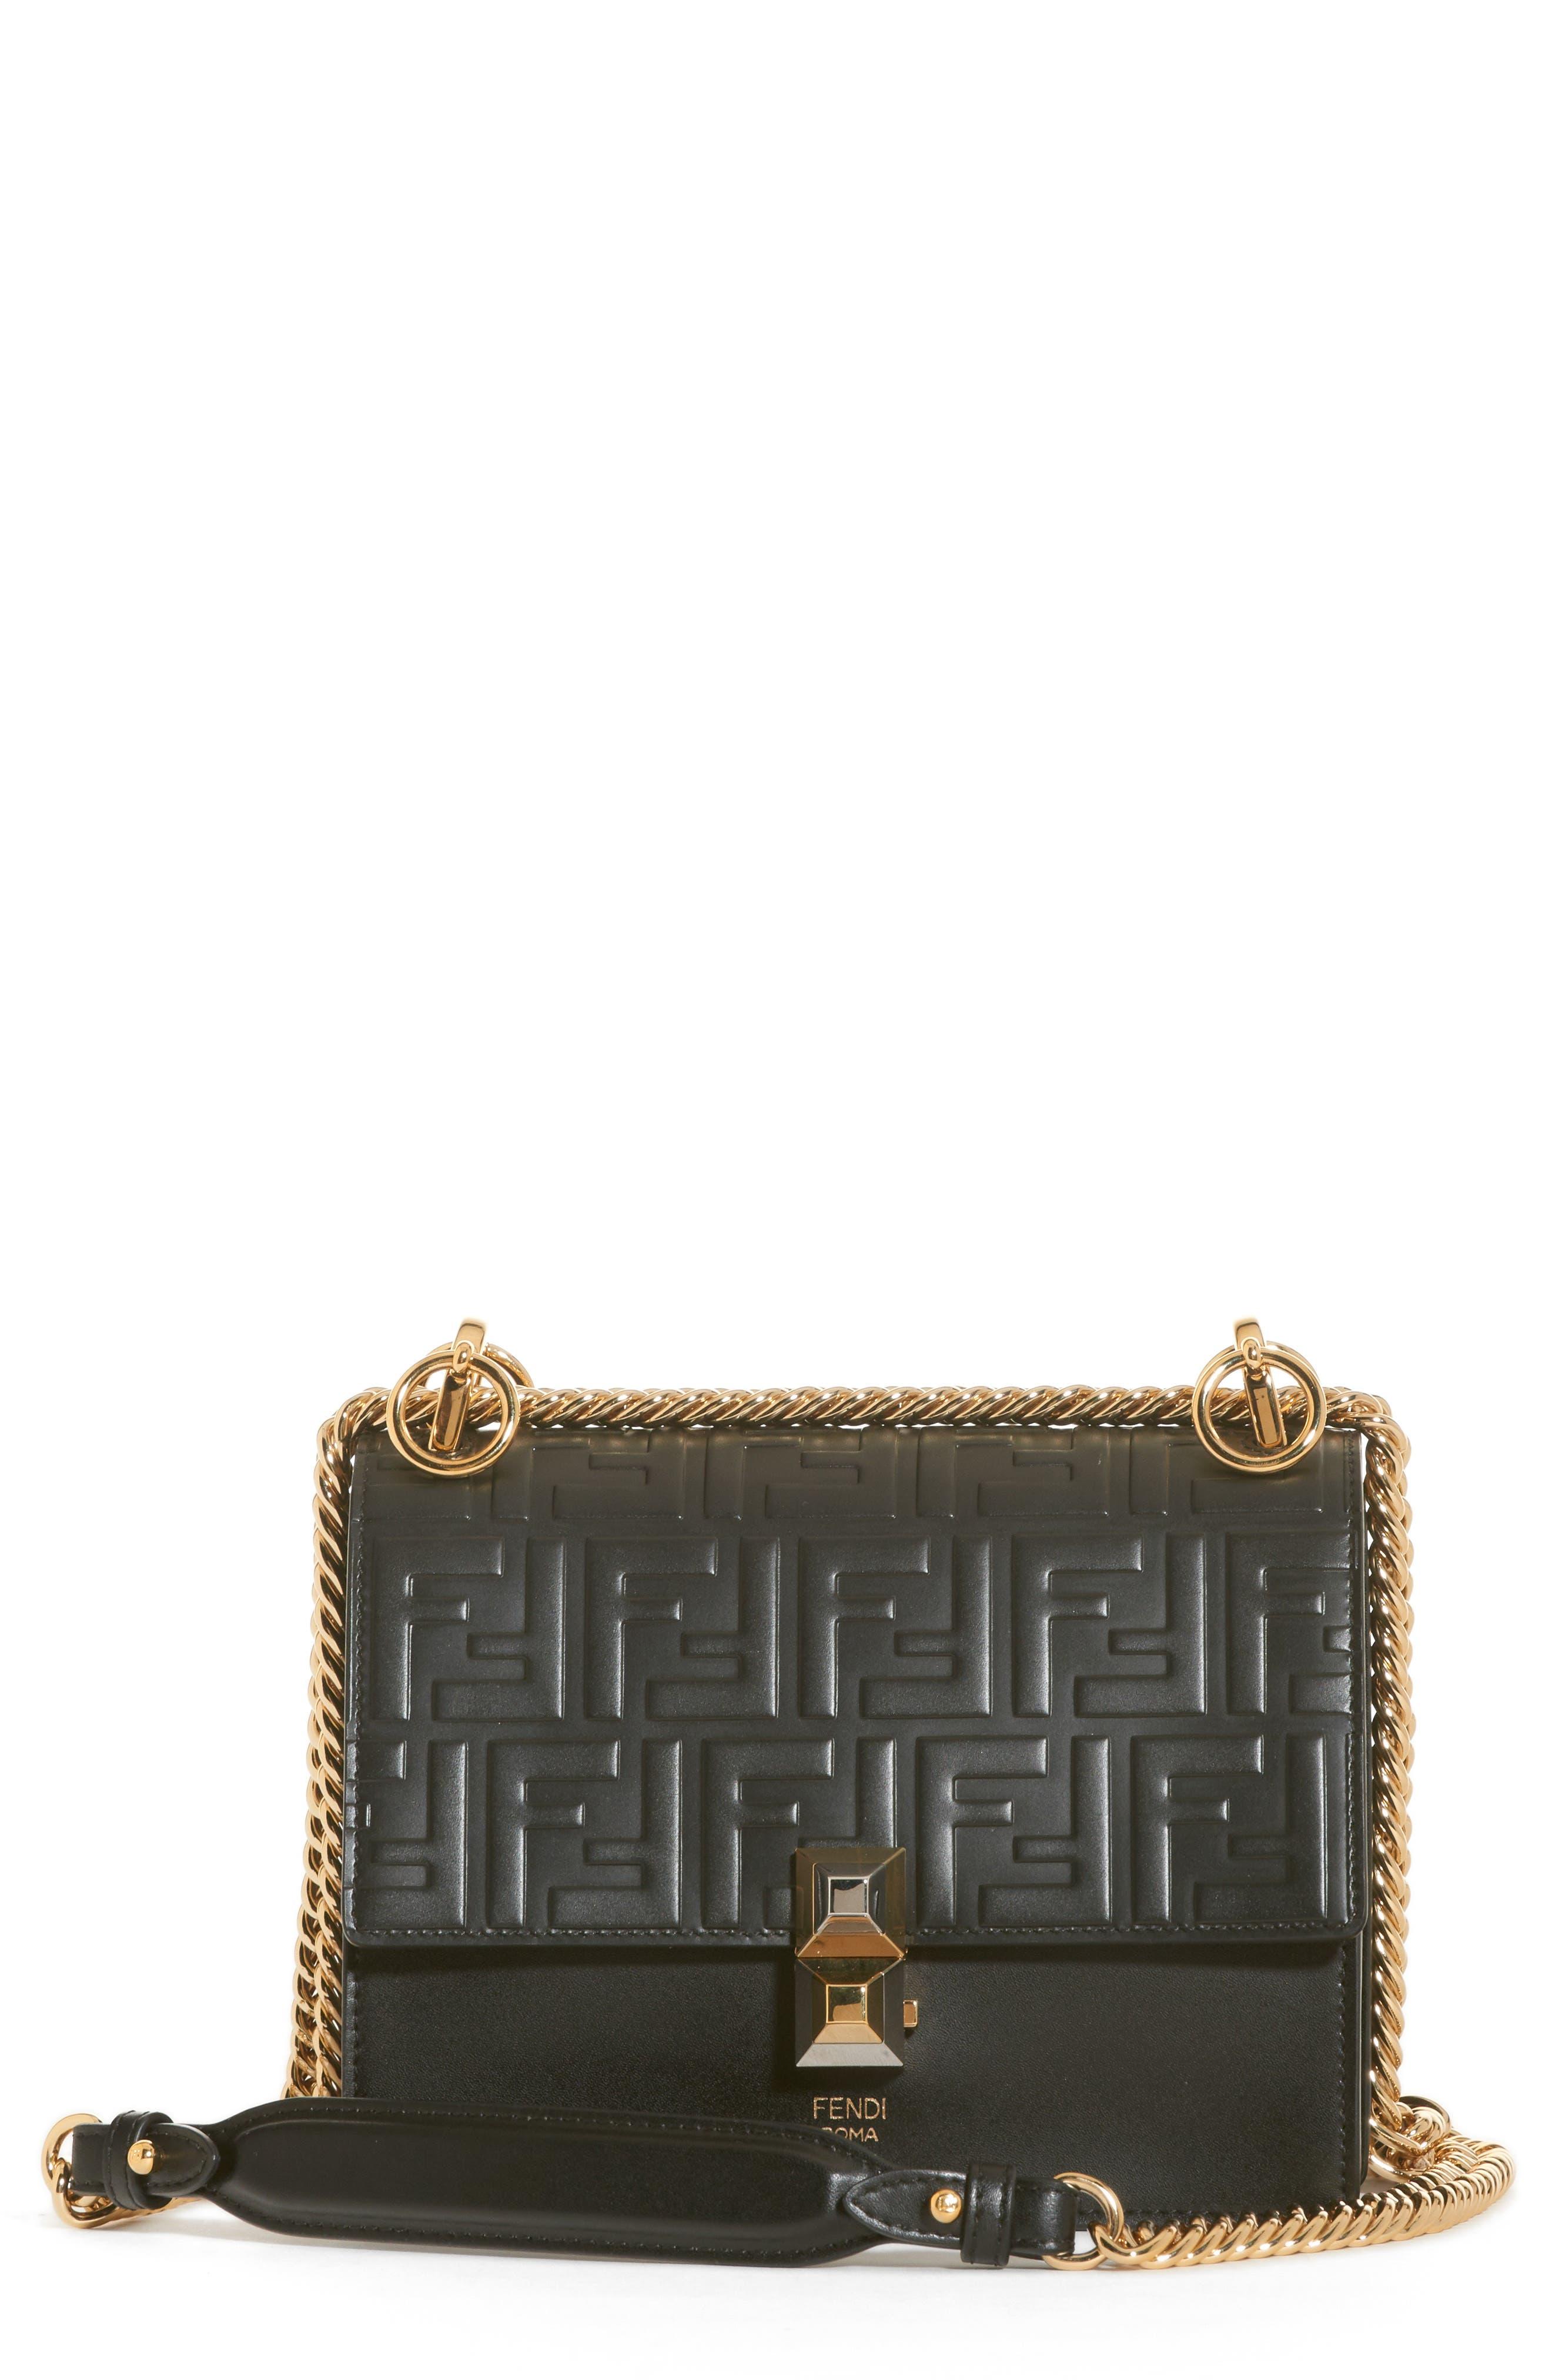 Small Leather Goods - Coin purses Fendi rq1bsaBEX